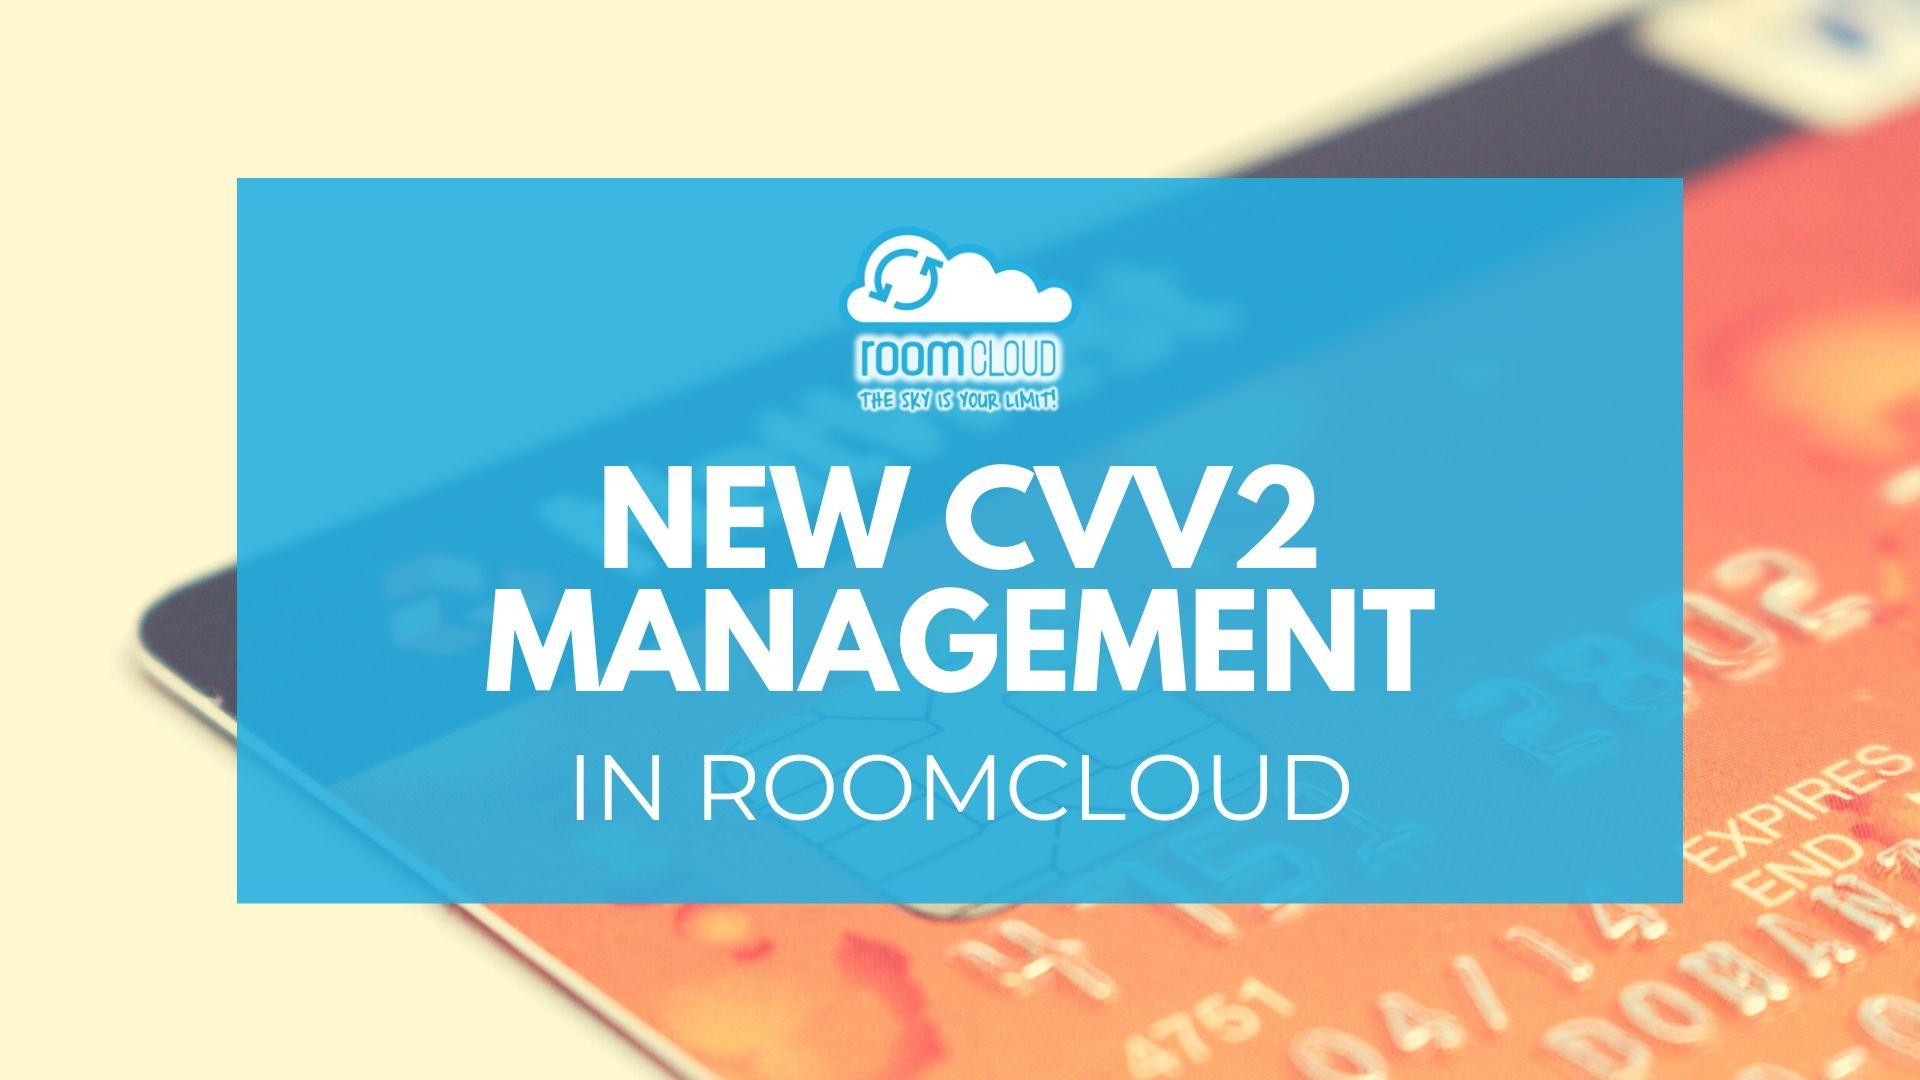 New management of CVV2 code in RoomCloud